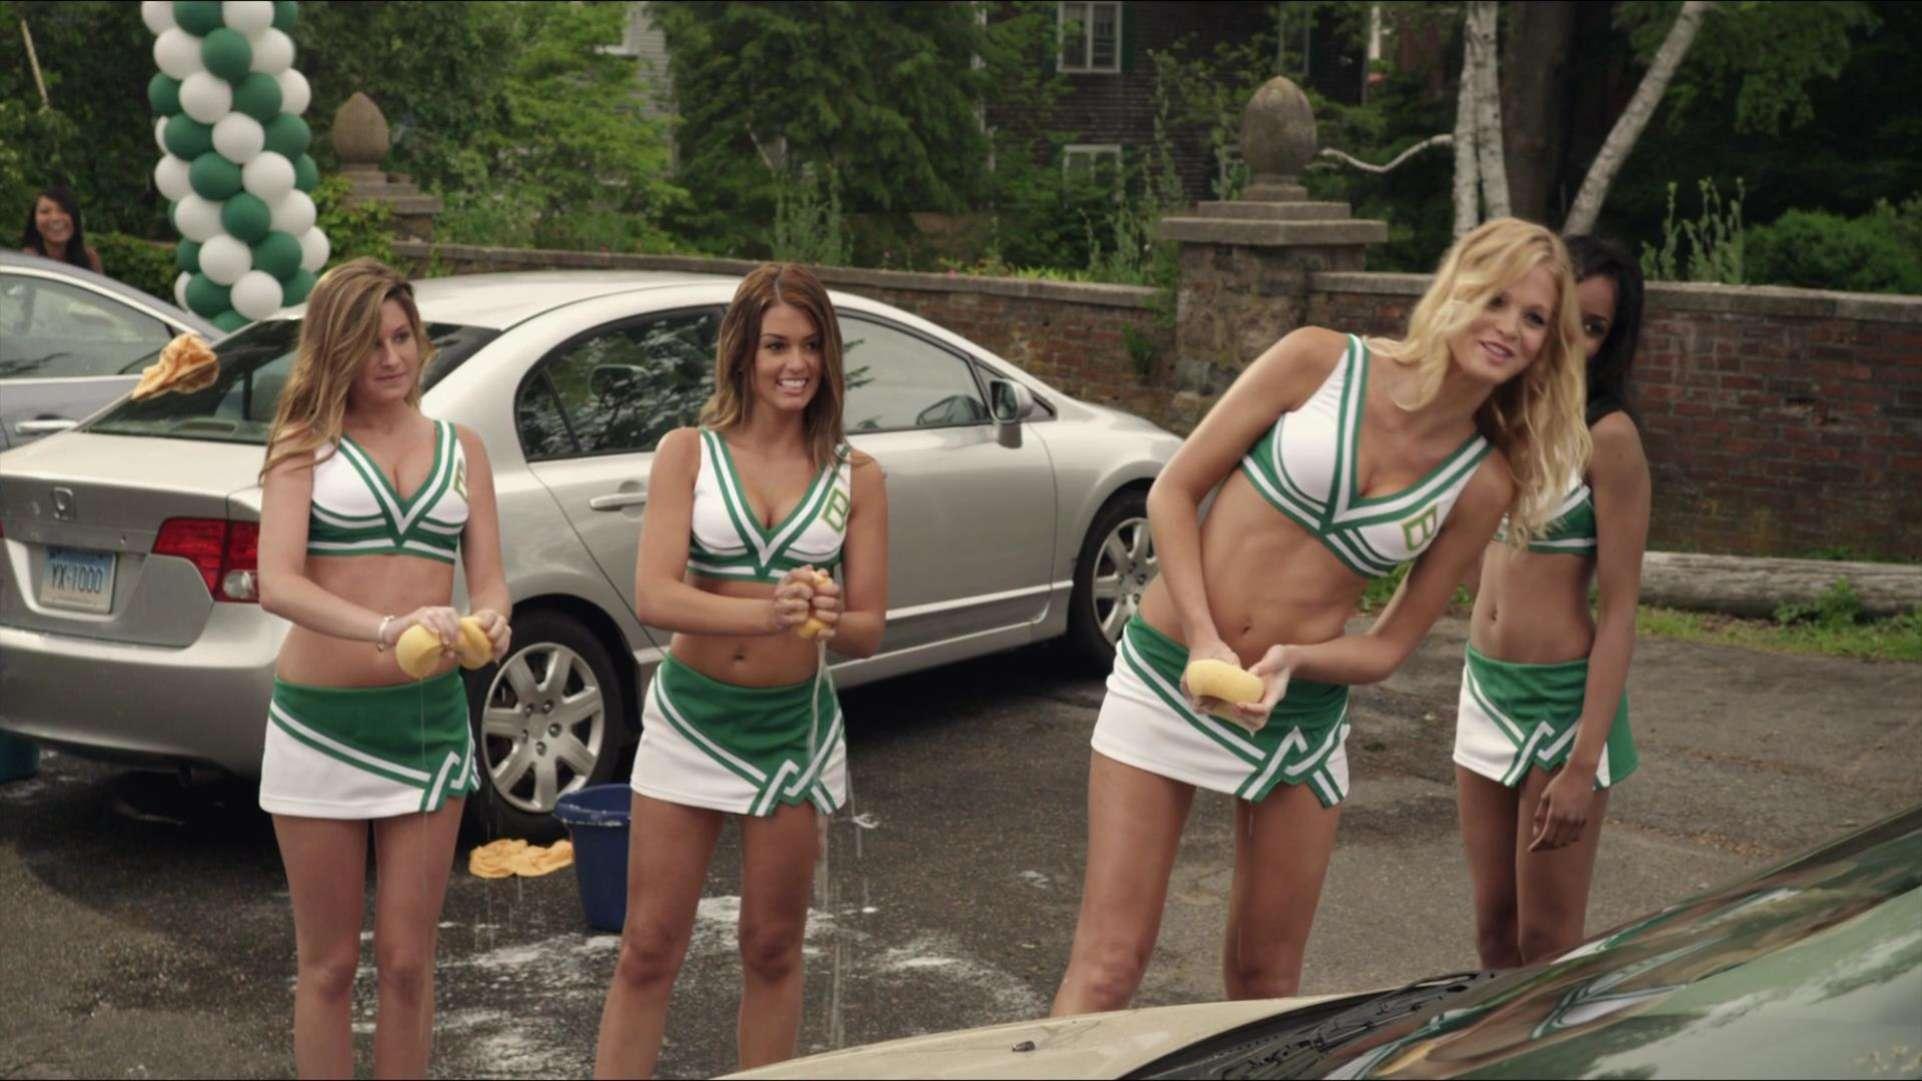 Erin Heatherton 2013 : Erin Heatherton Hot in Grown Ups 2-11